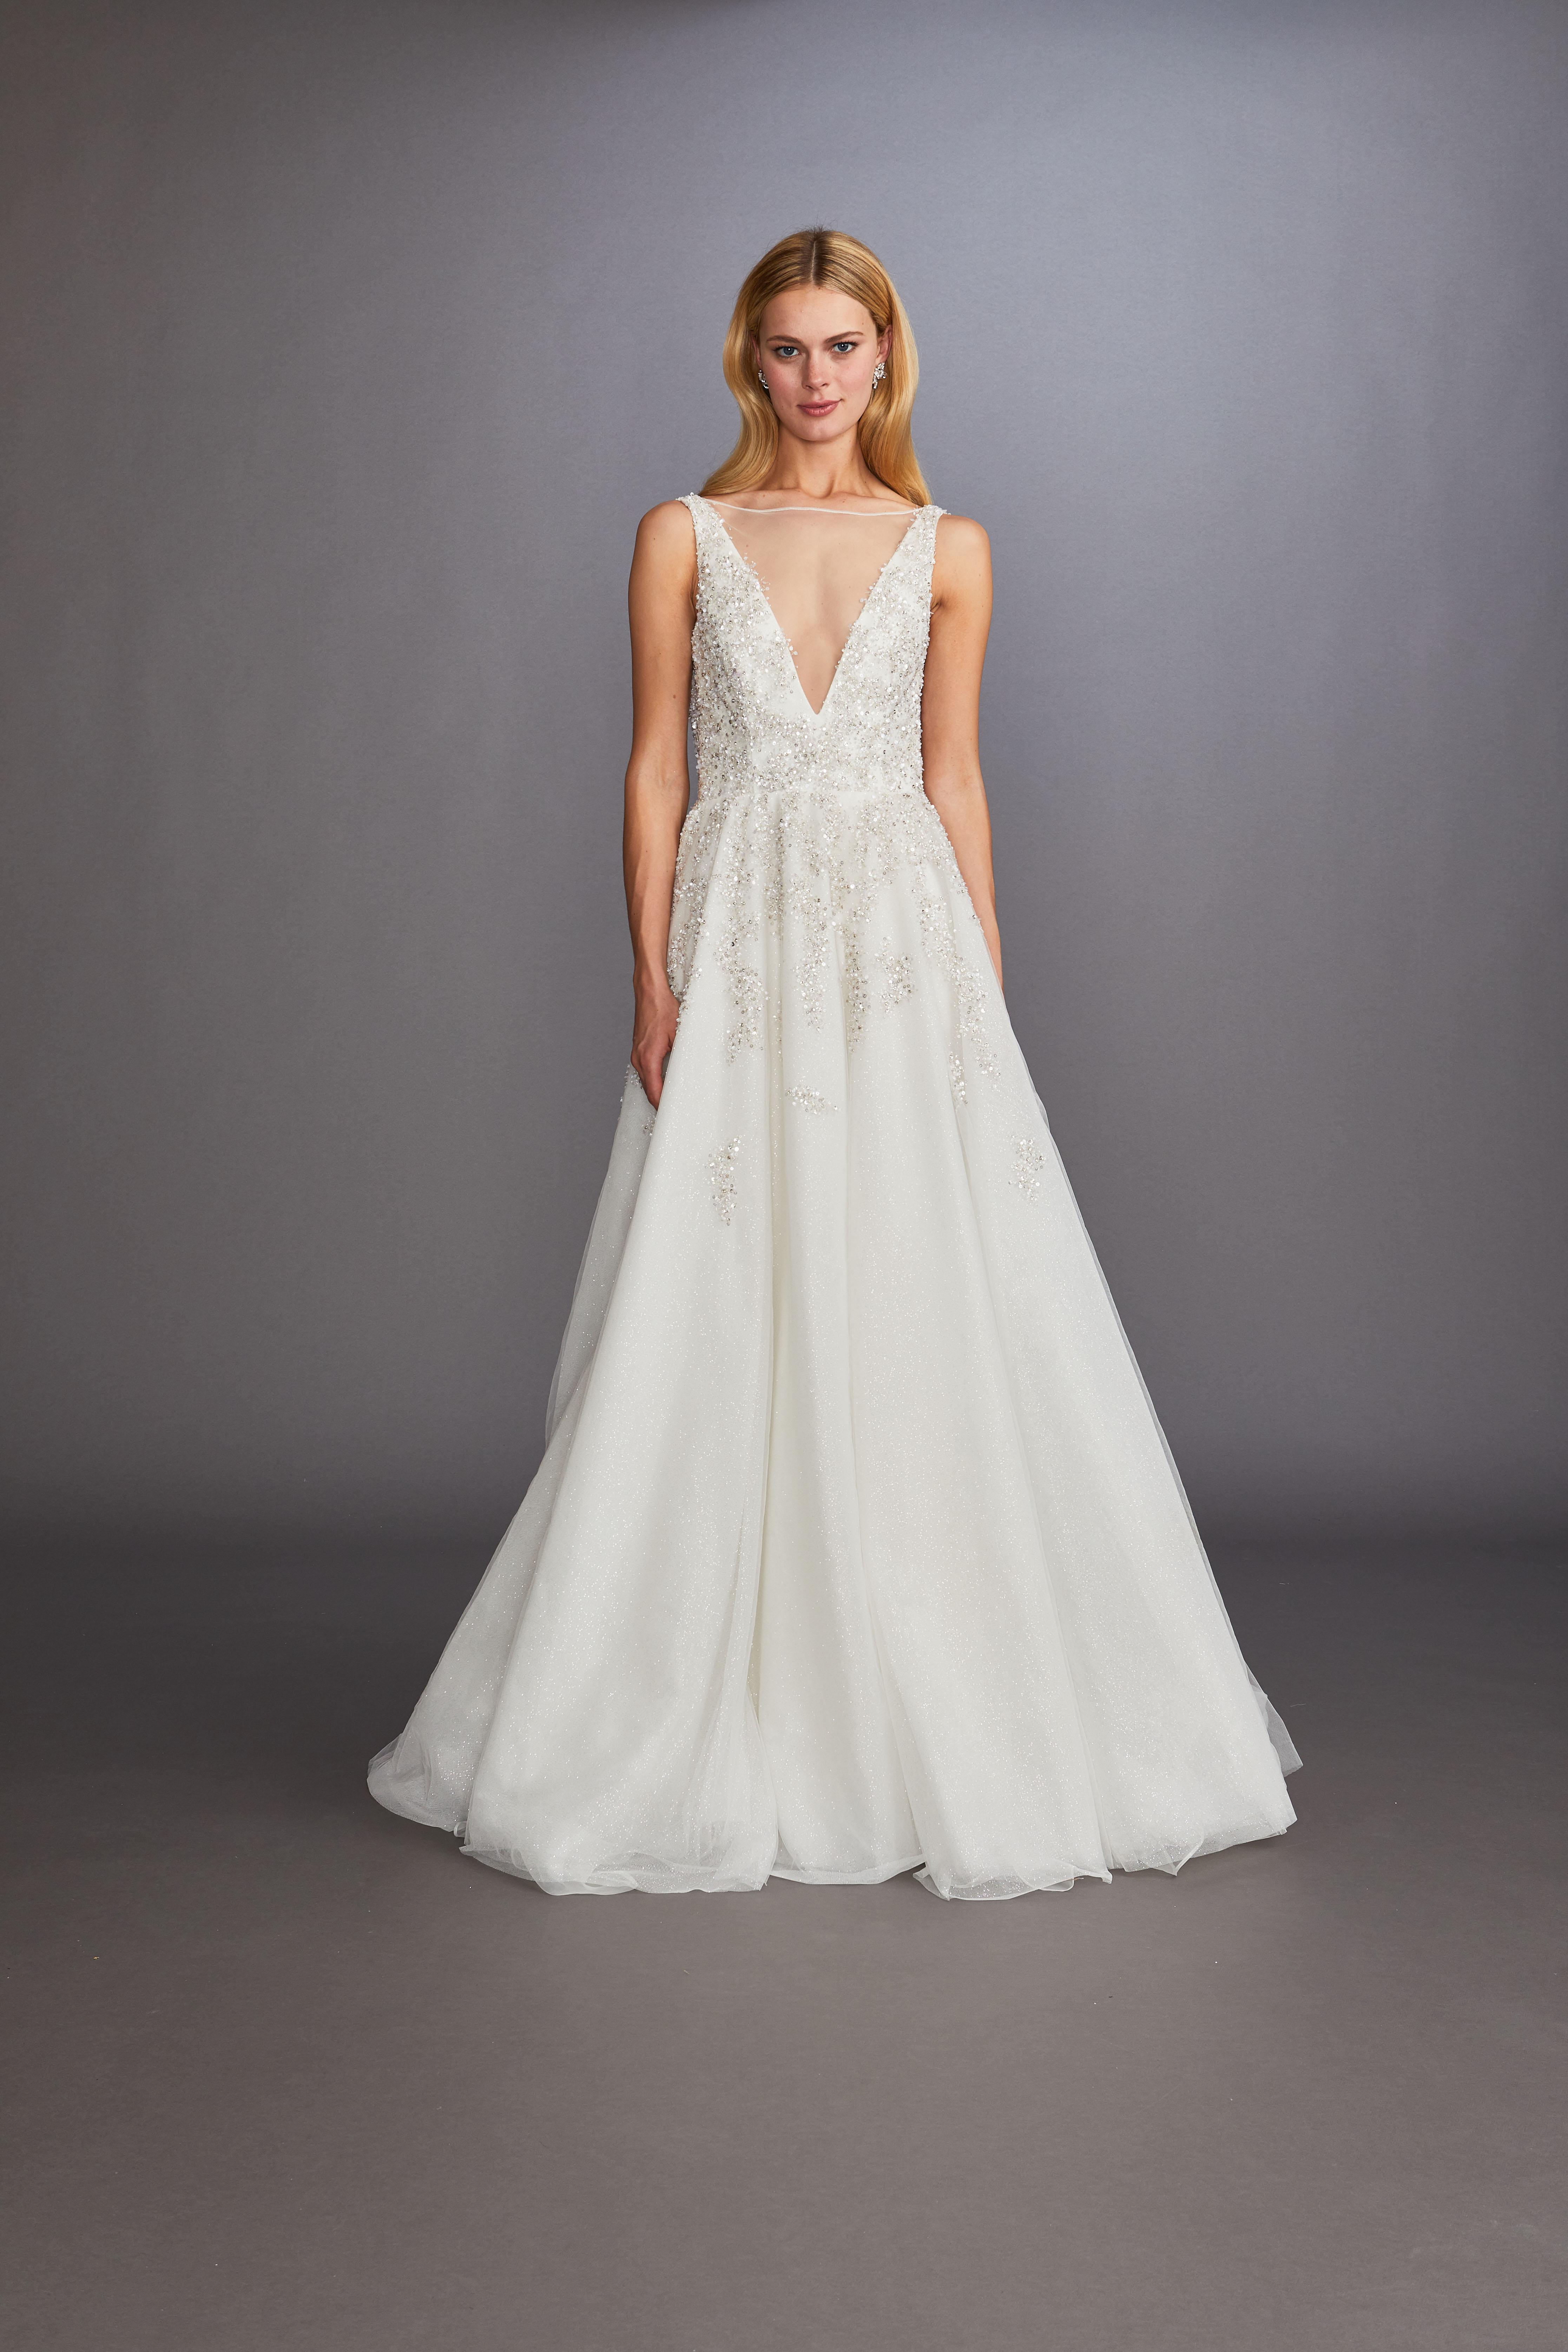 illusion boat neck sleeveless beaded a-line wedding dress Allison Webb Spring 2020